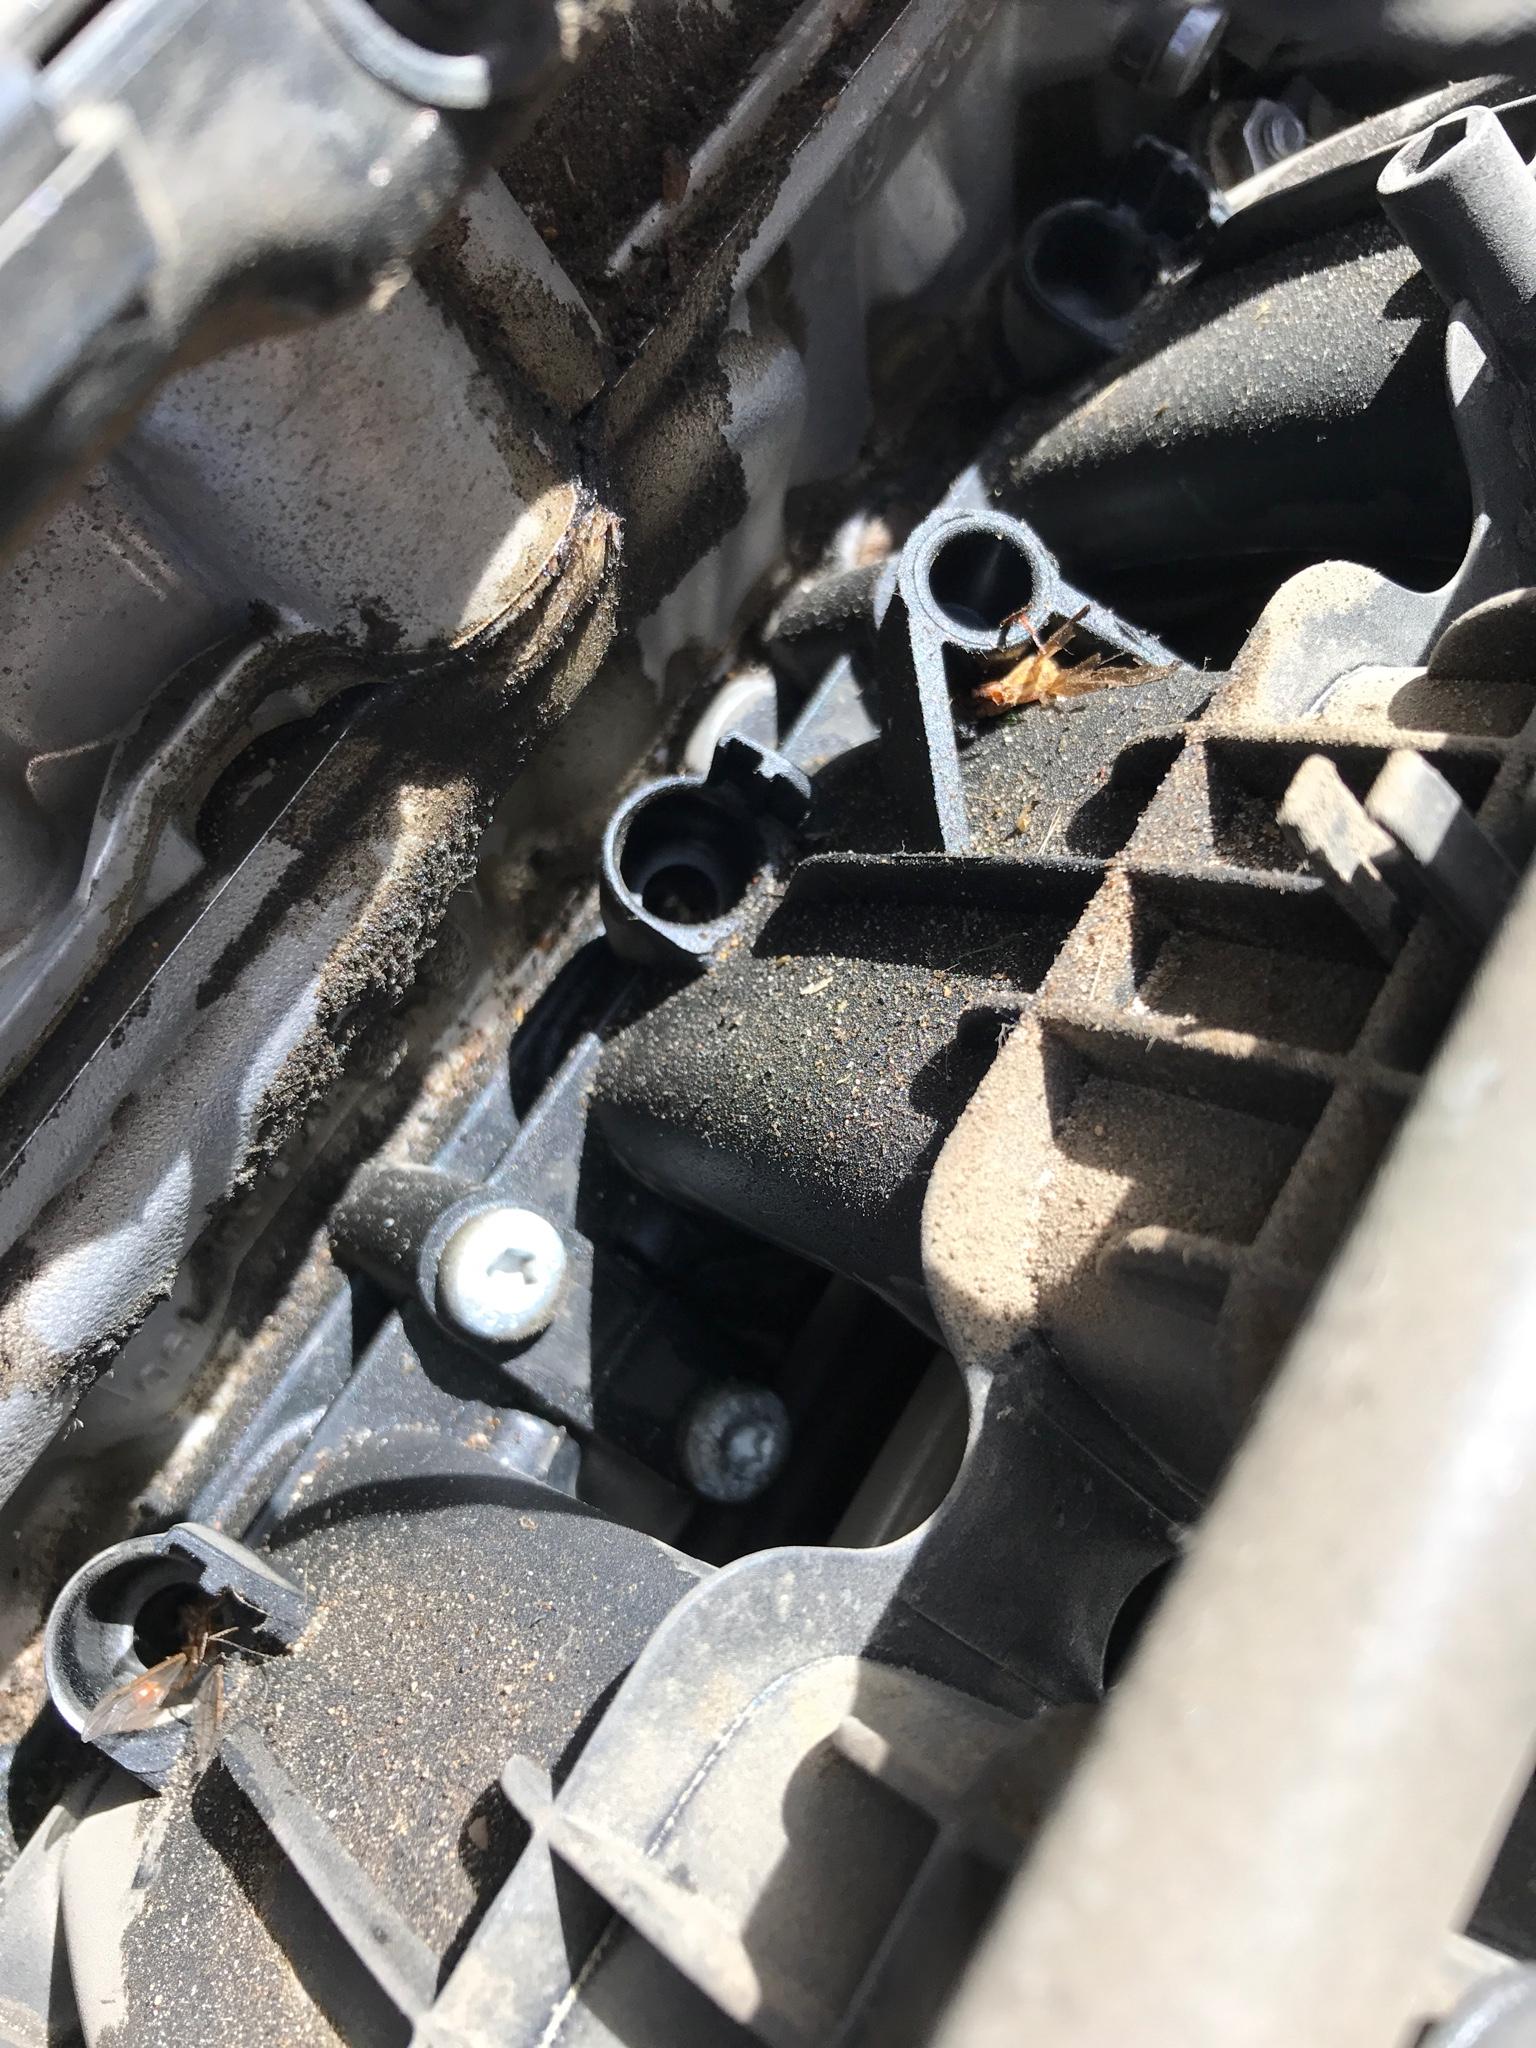 Engine Valve Cover Grommet For Audi 4000 VW Beetle Cabrio Cabriolet Jetta Passat